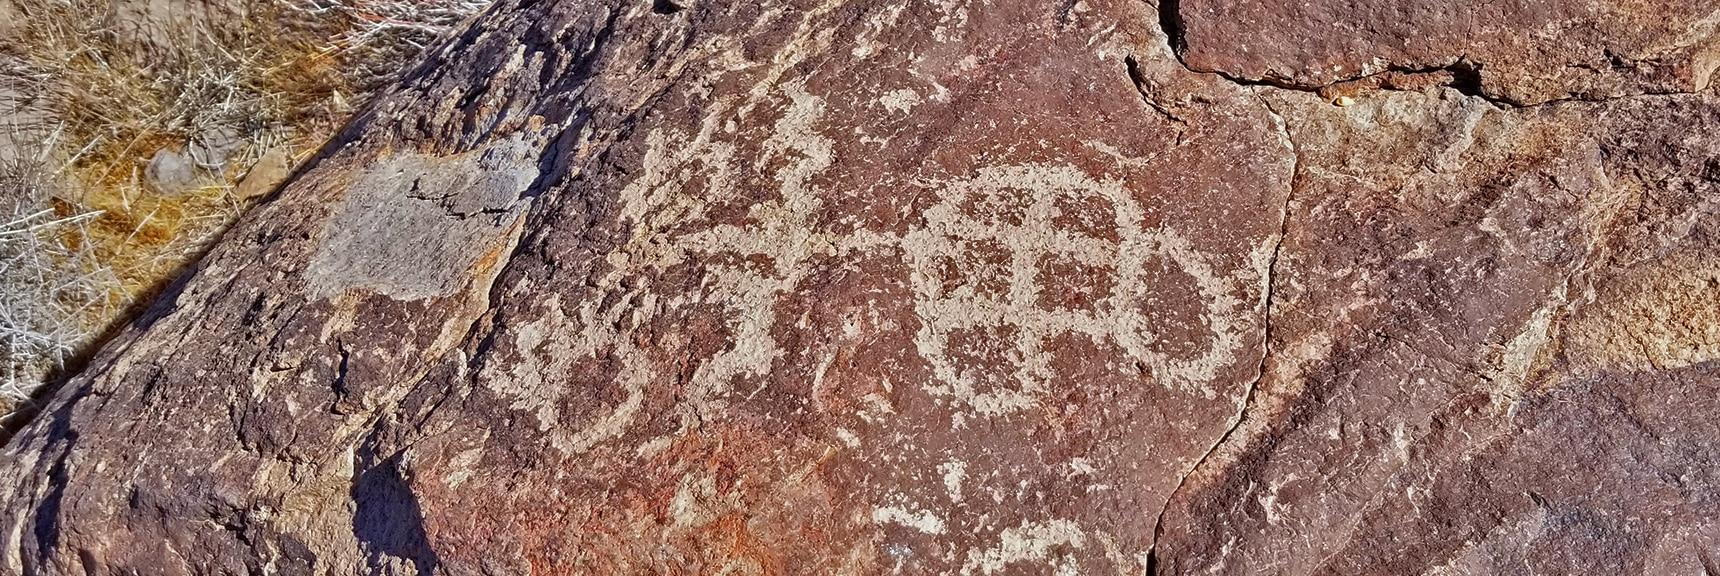 Petroglyphs in Petroglyph Canyon | Sloan Canyon National Conservation Area, Nevada